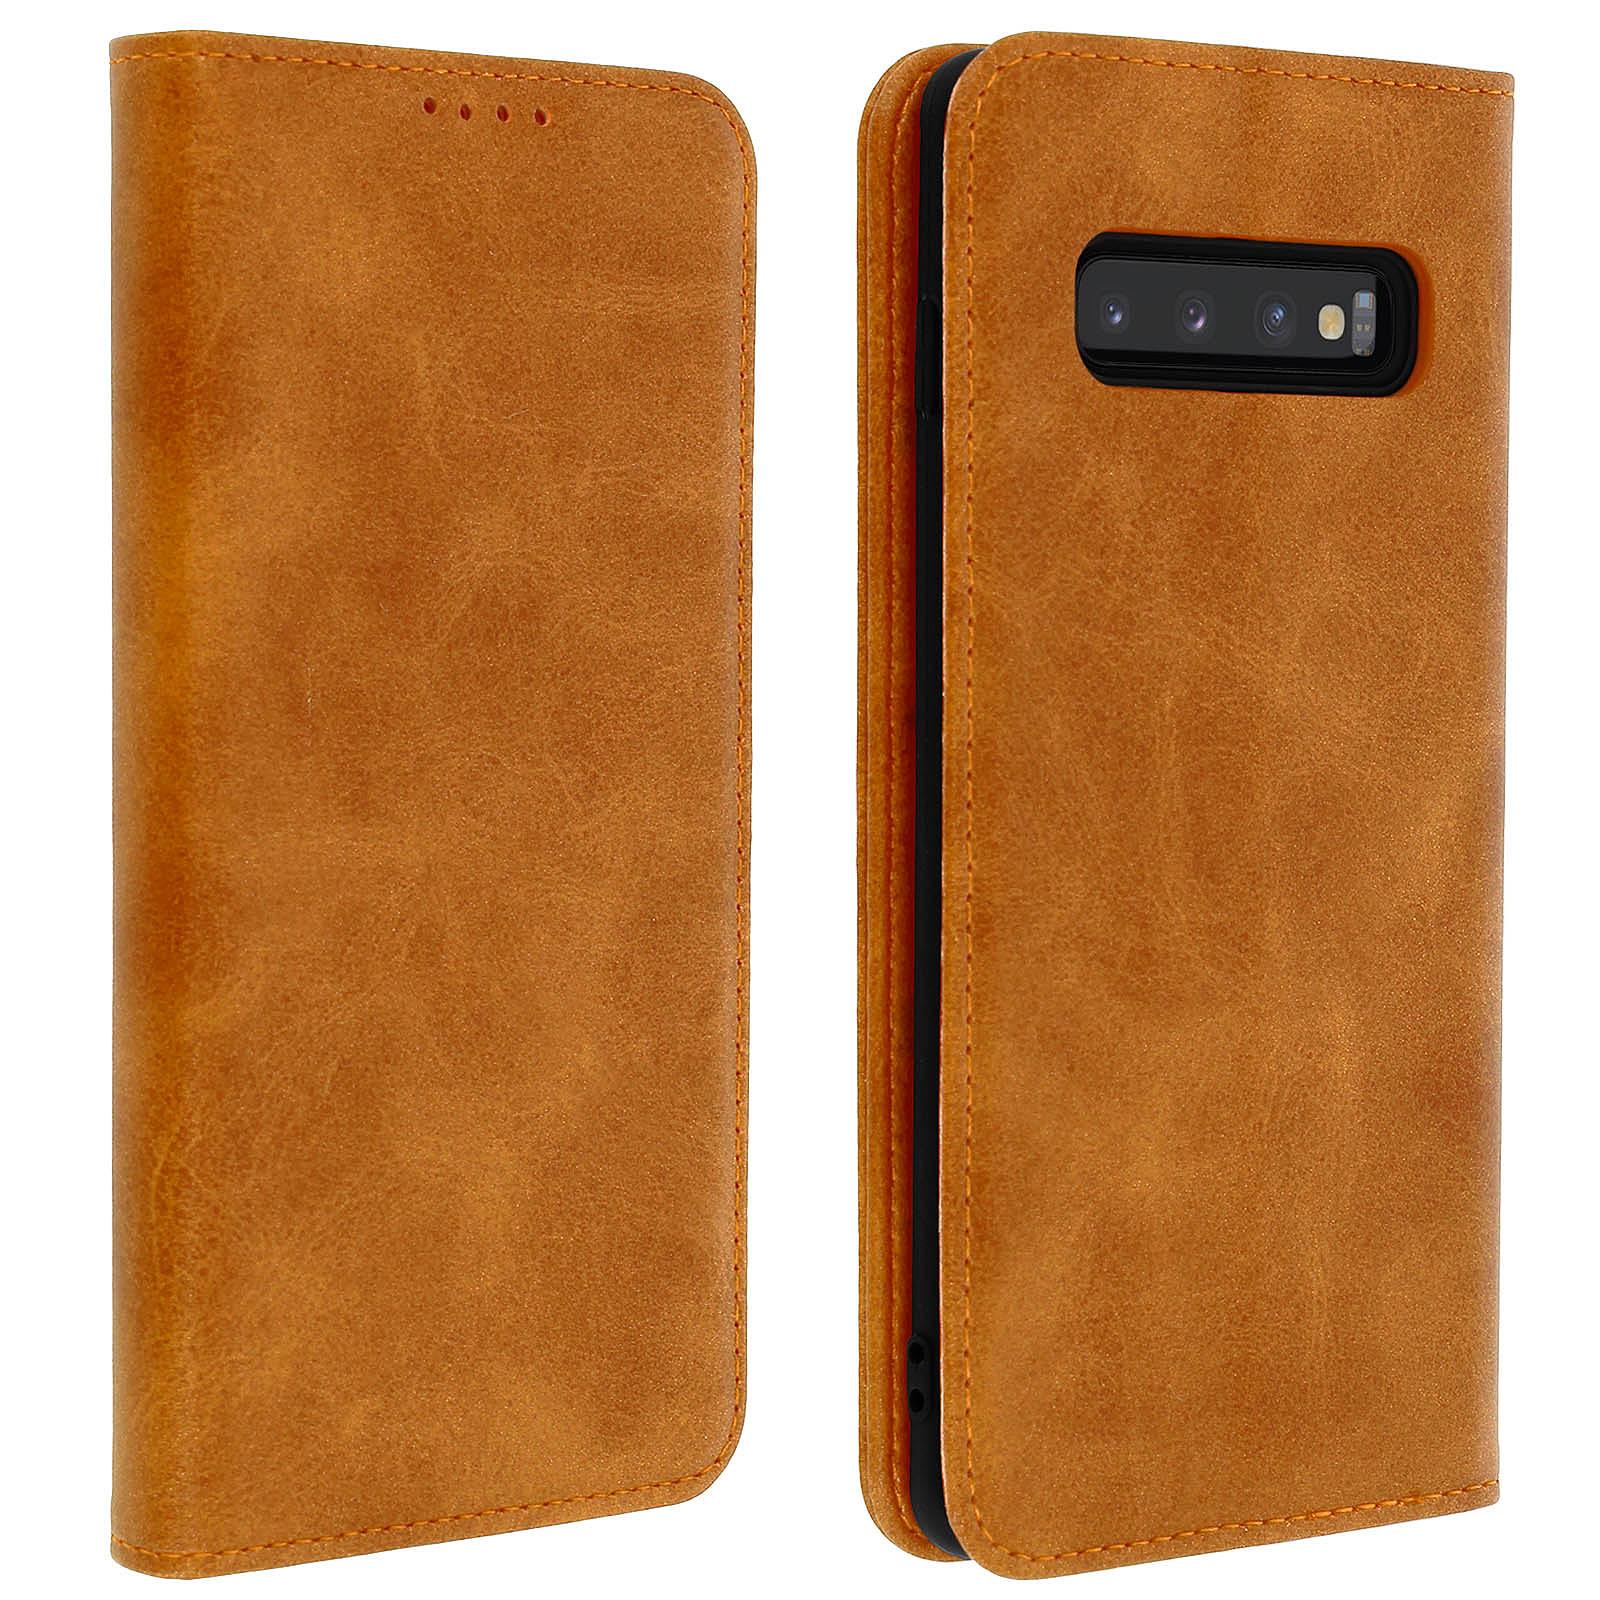 Avizar Etui folio Camel Vieilli pour Samsung Galaxy S10 Plus